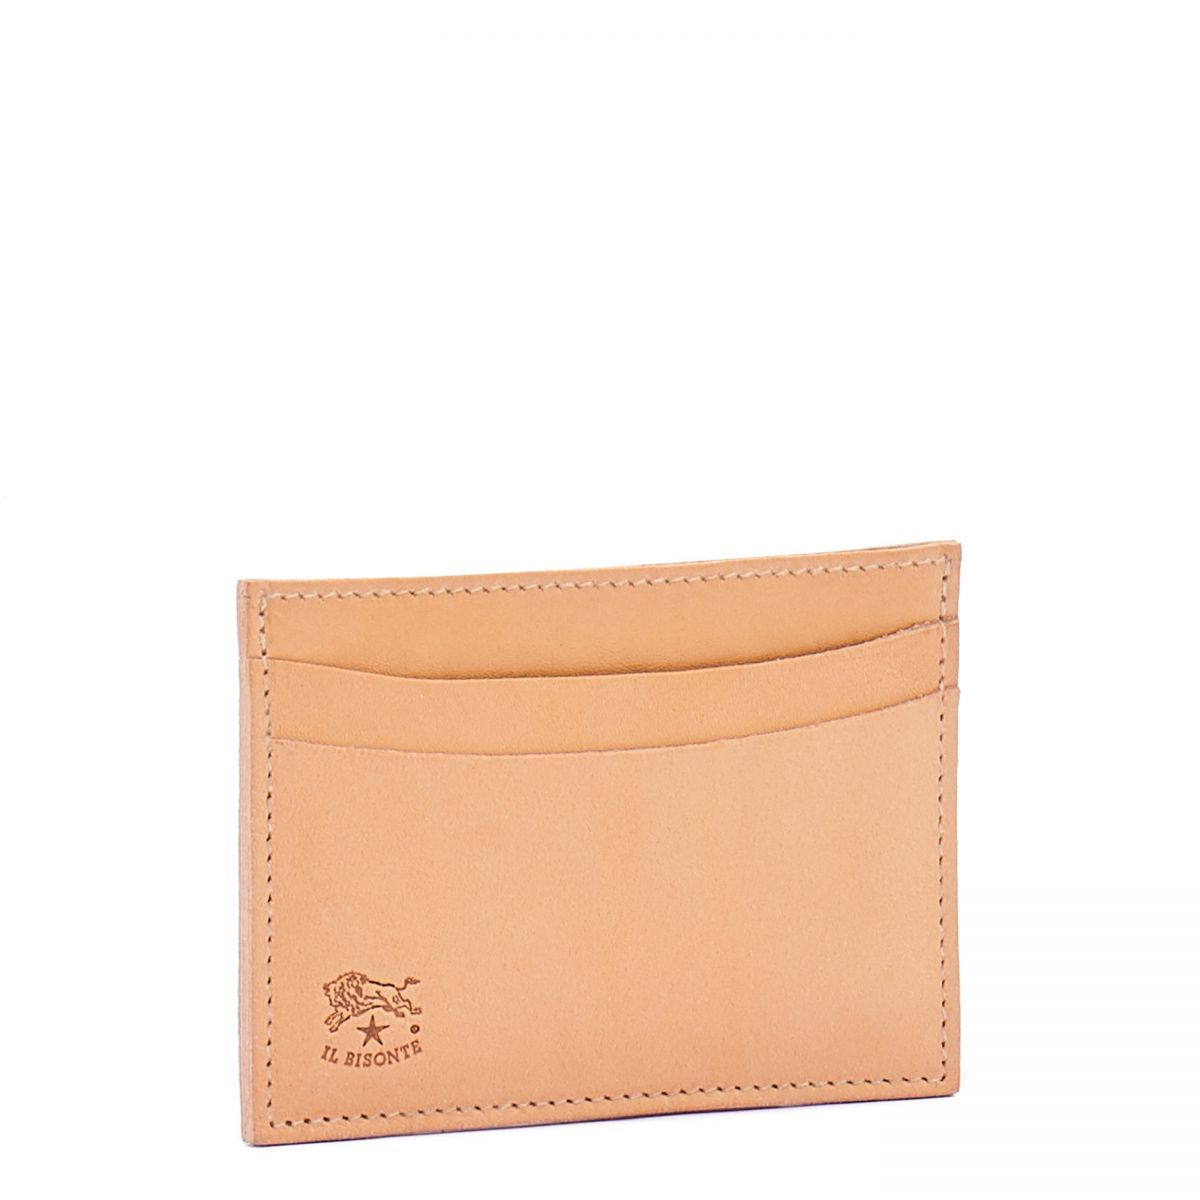 Porta Carte  in Doppia Pelle Di Vacchetta SCC019 colore Naturale | Details